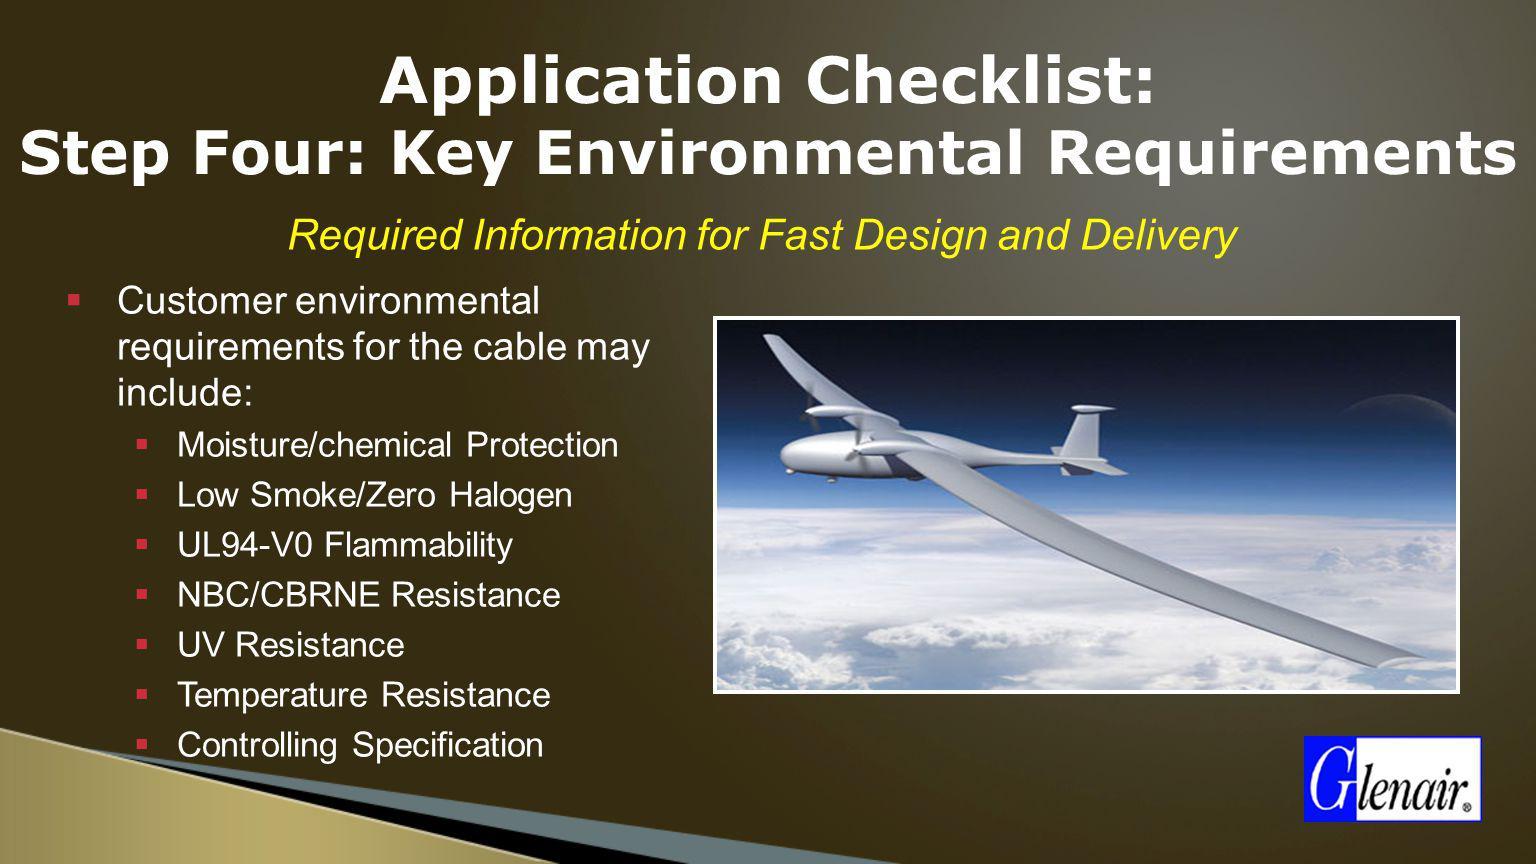 Application Checklist: Step Four: Key Environmental Requirements